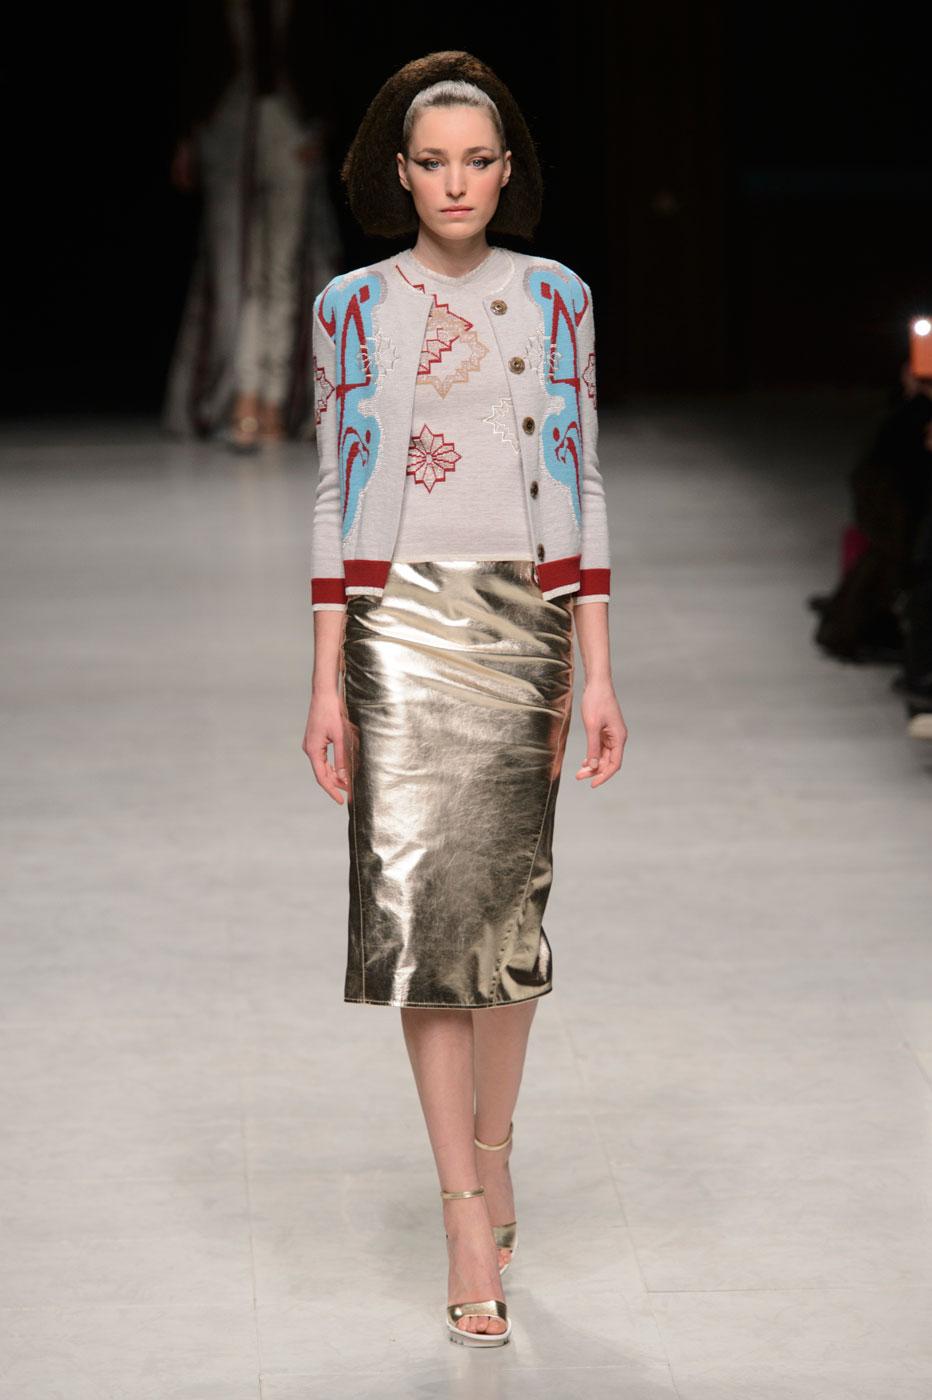 Julien-Fournie-Prive-fashion-runway-show-haute-couture-paris-spring-2015-the-impression-08